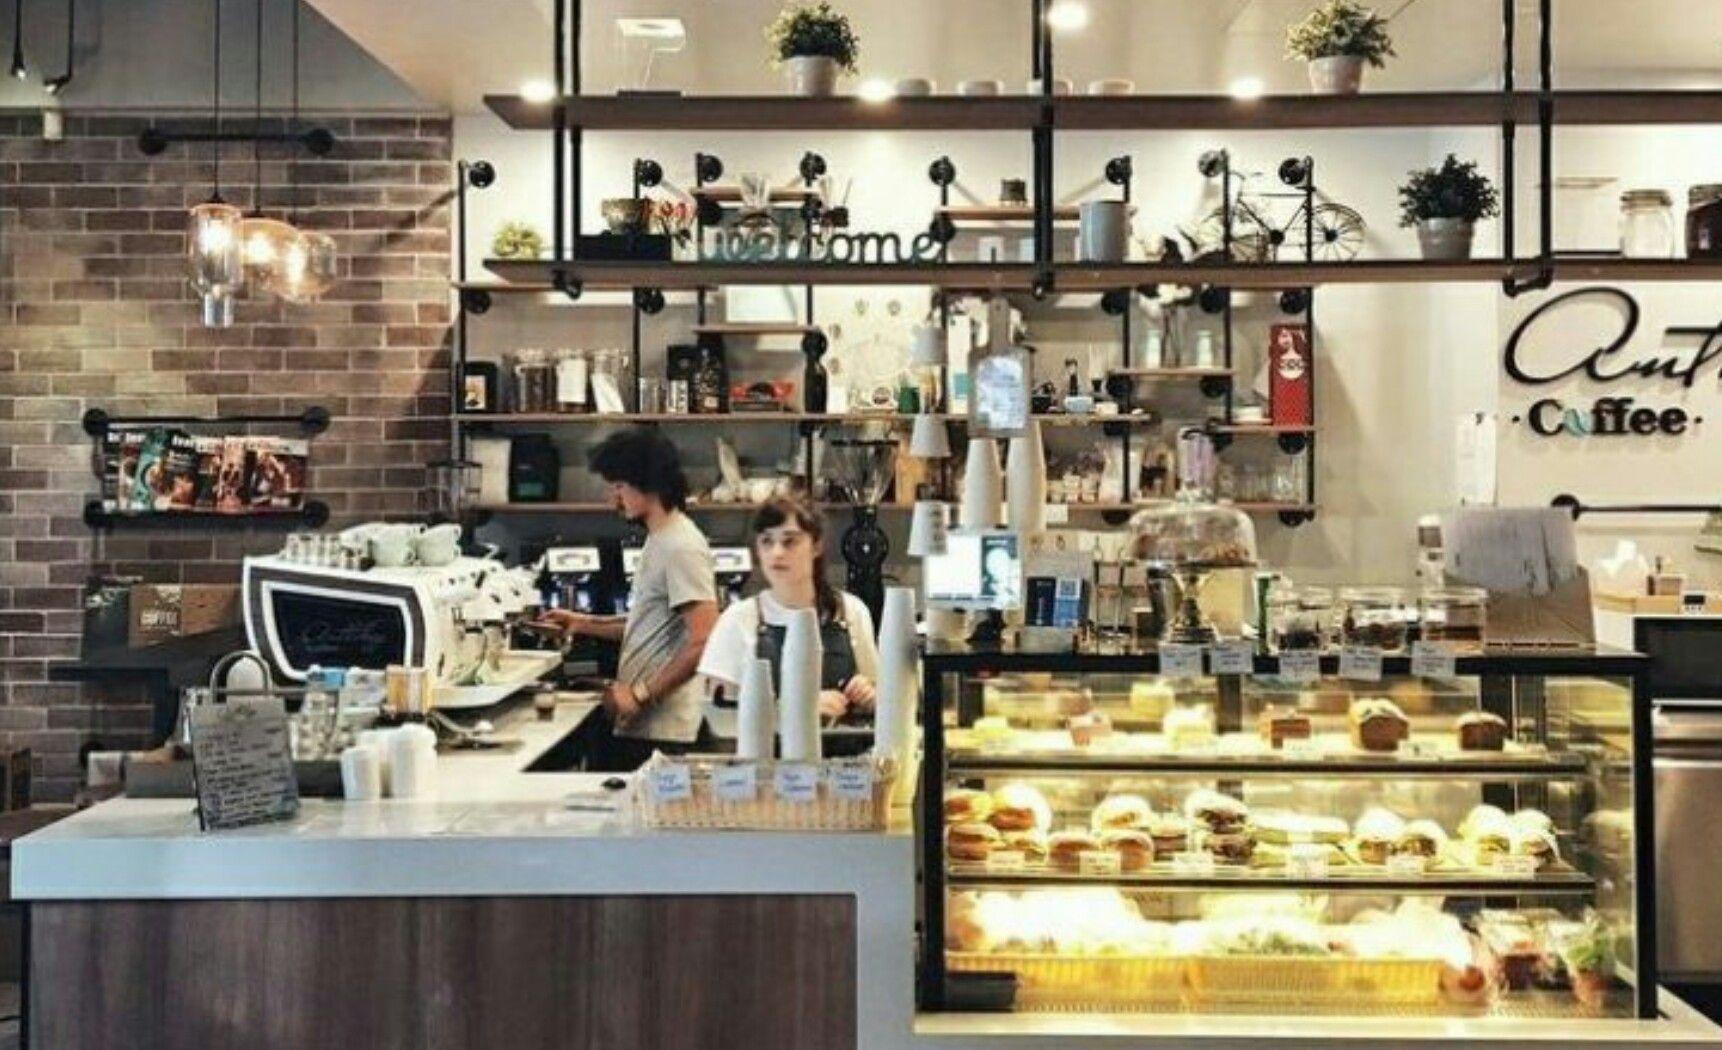 Pin By T Rae Meier On Coffee Shop Dream Coffee Shop Names Small Coffee Shop Best Coffee Shop